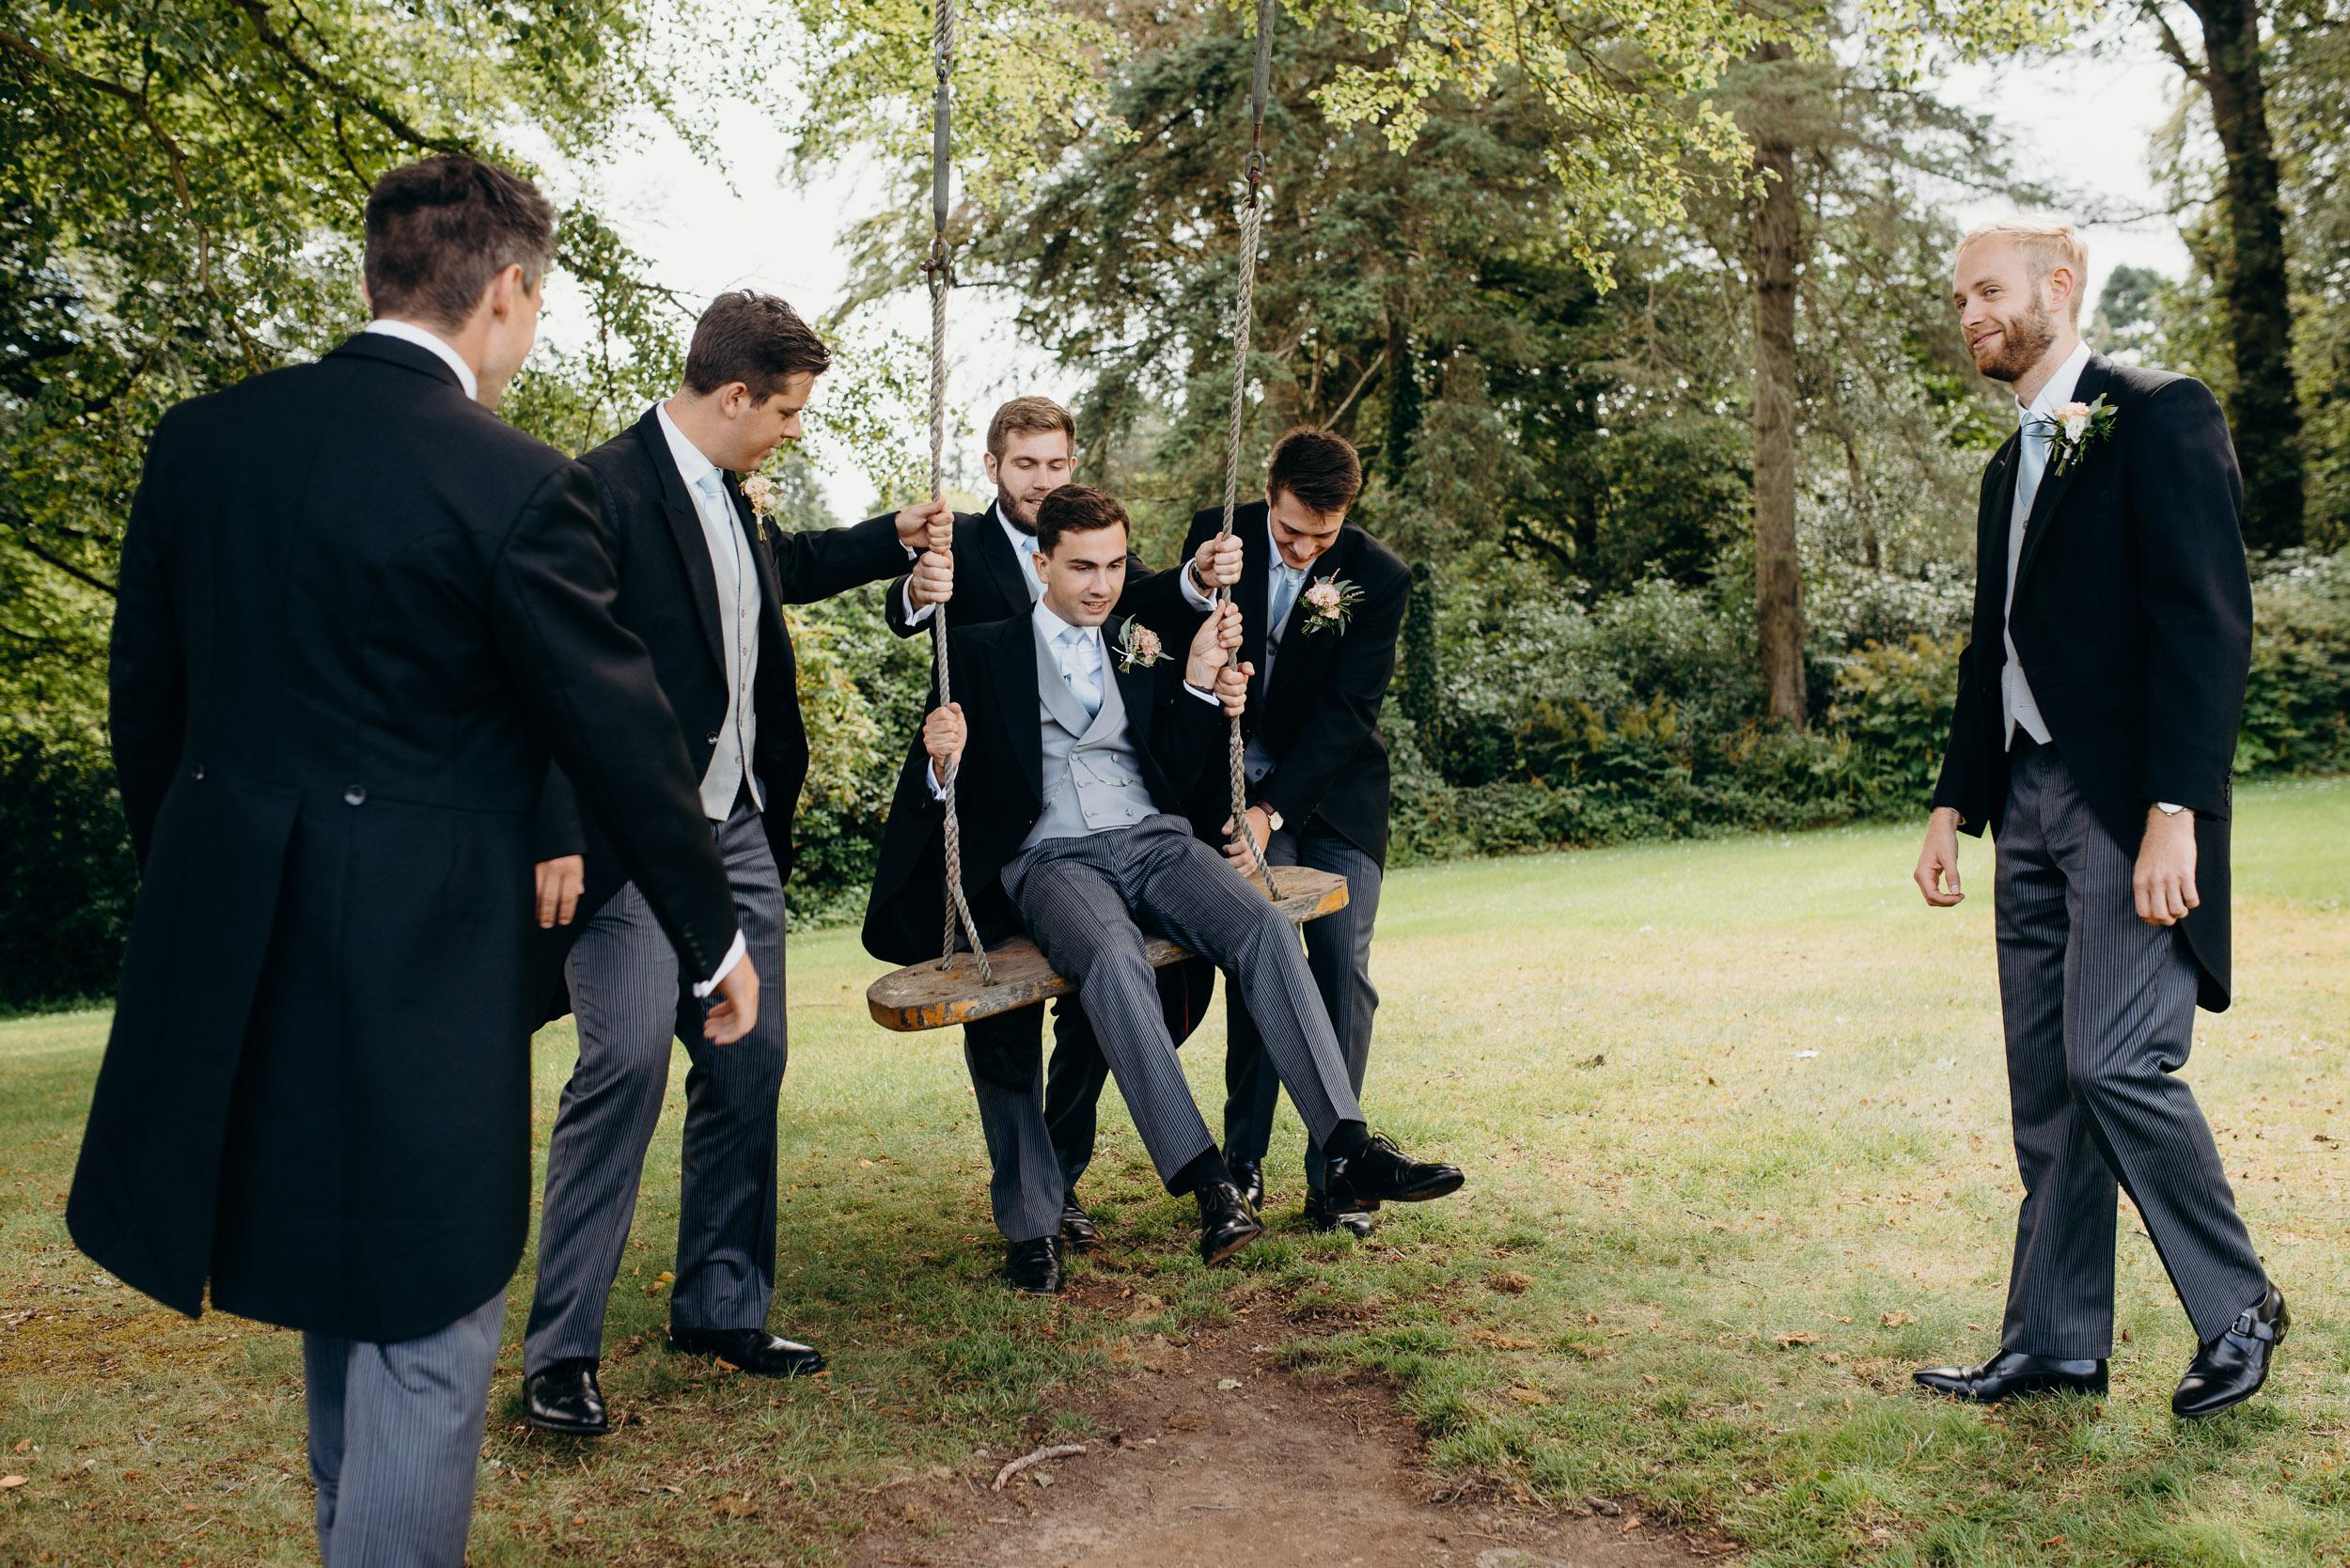 drenagh estate wedding photography-70.jpg